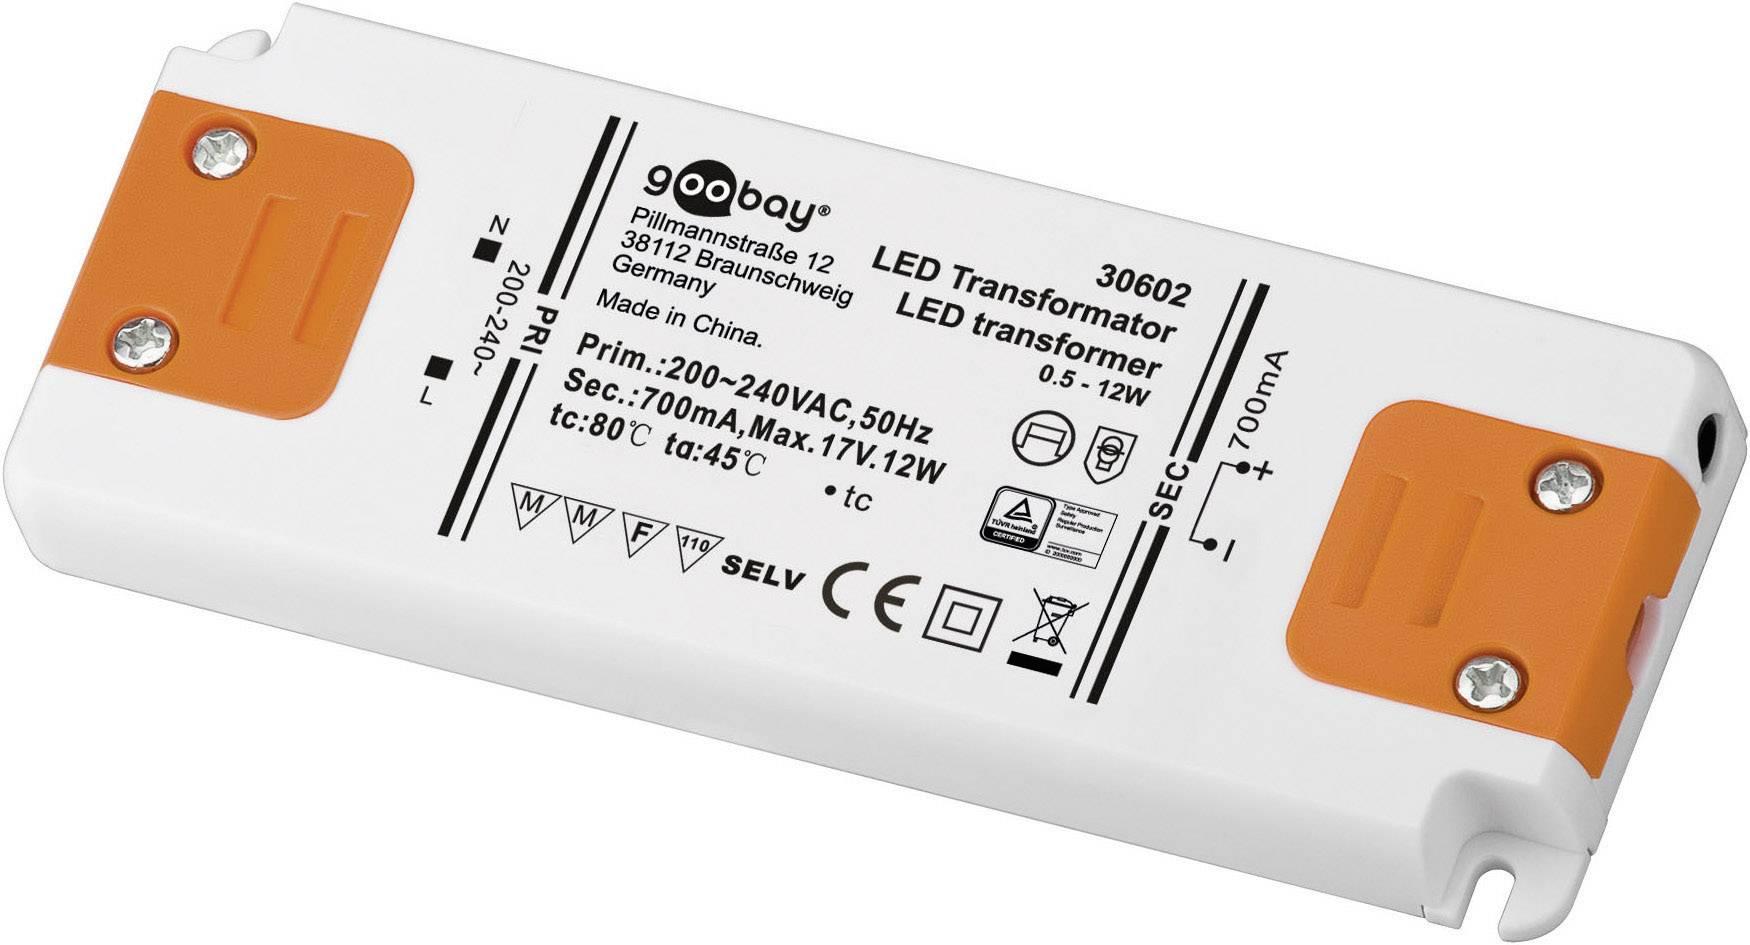 Vstavateľný LED driver Goobay SET CC 700-12 LED, 12 W (max), 0.7 A, 0 - 17 V/DC